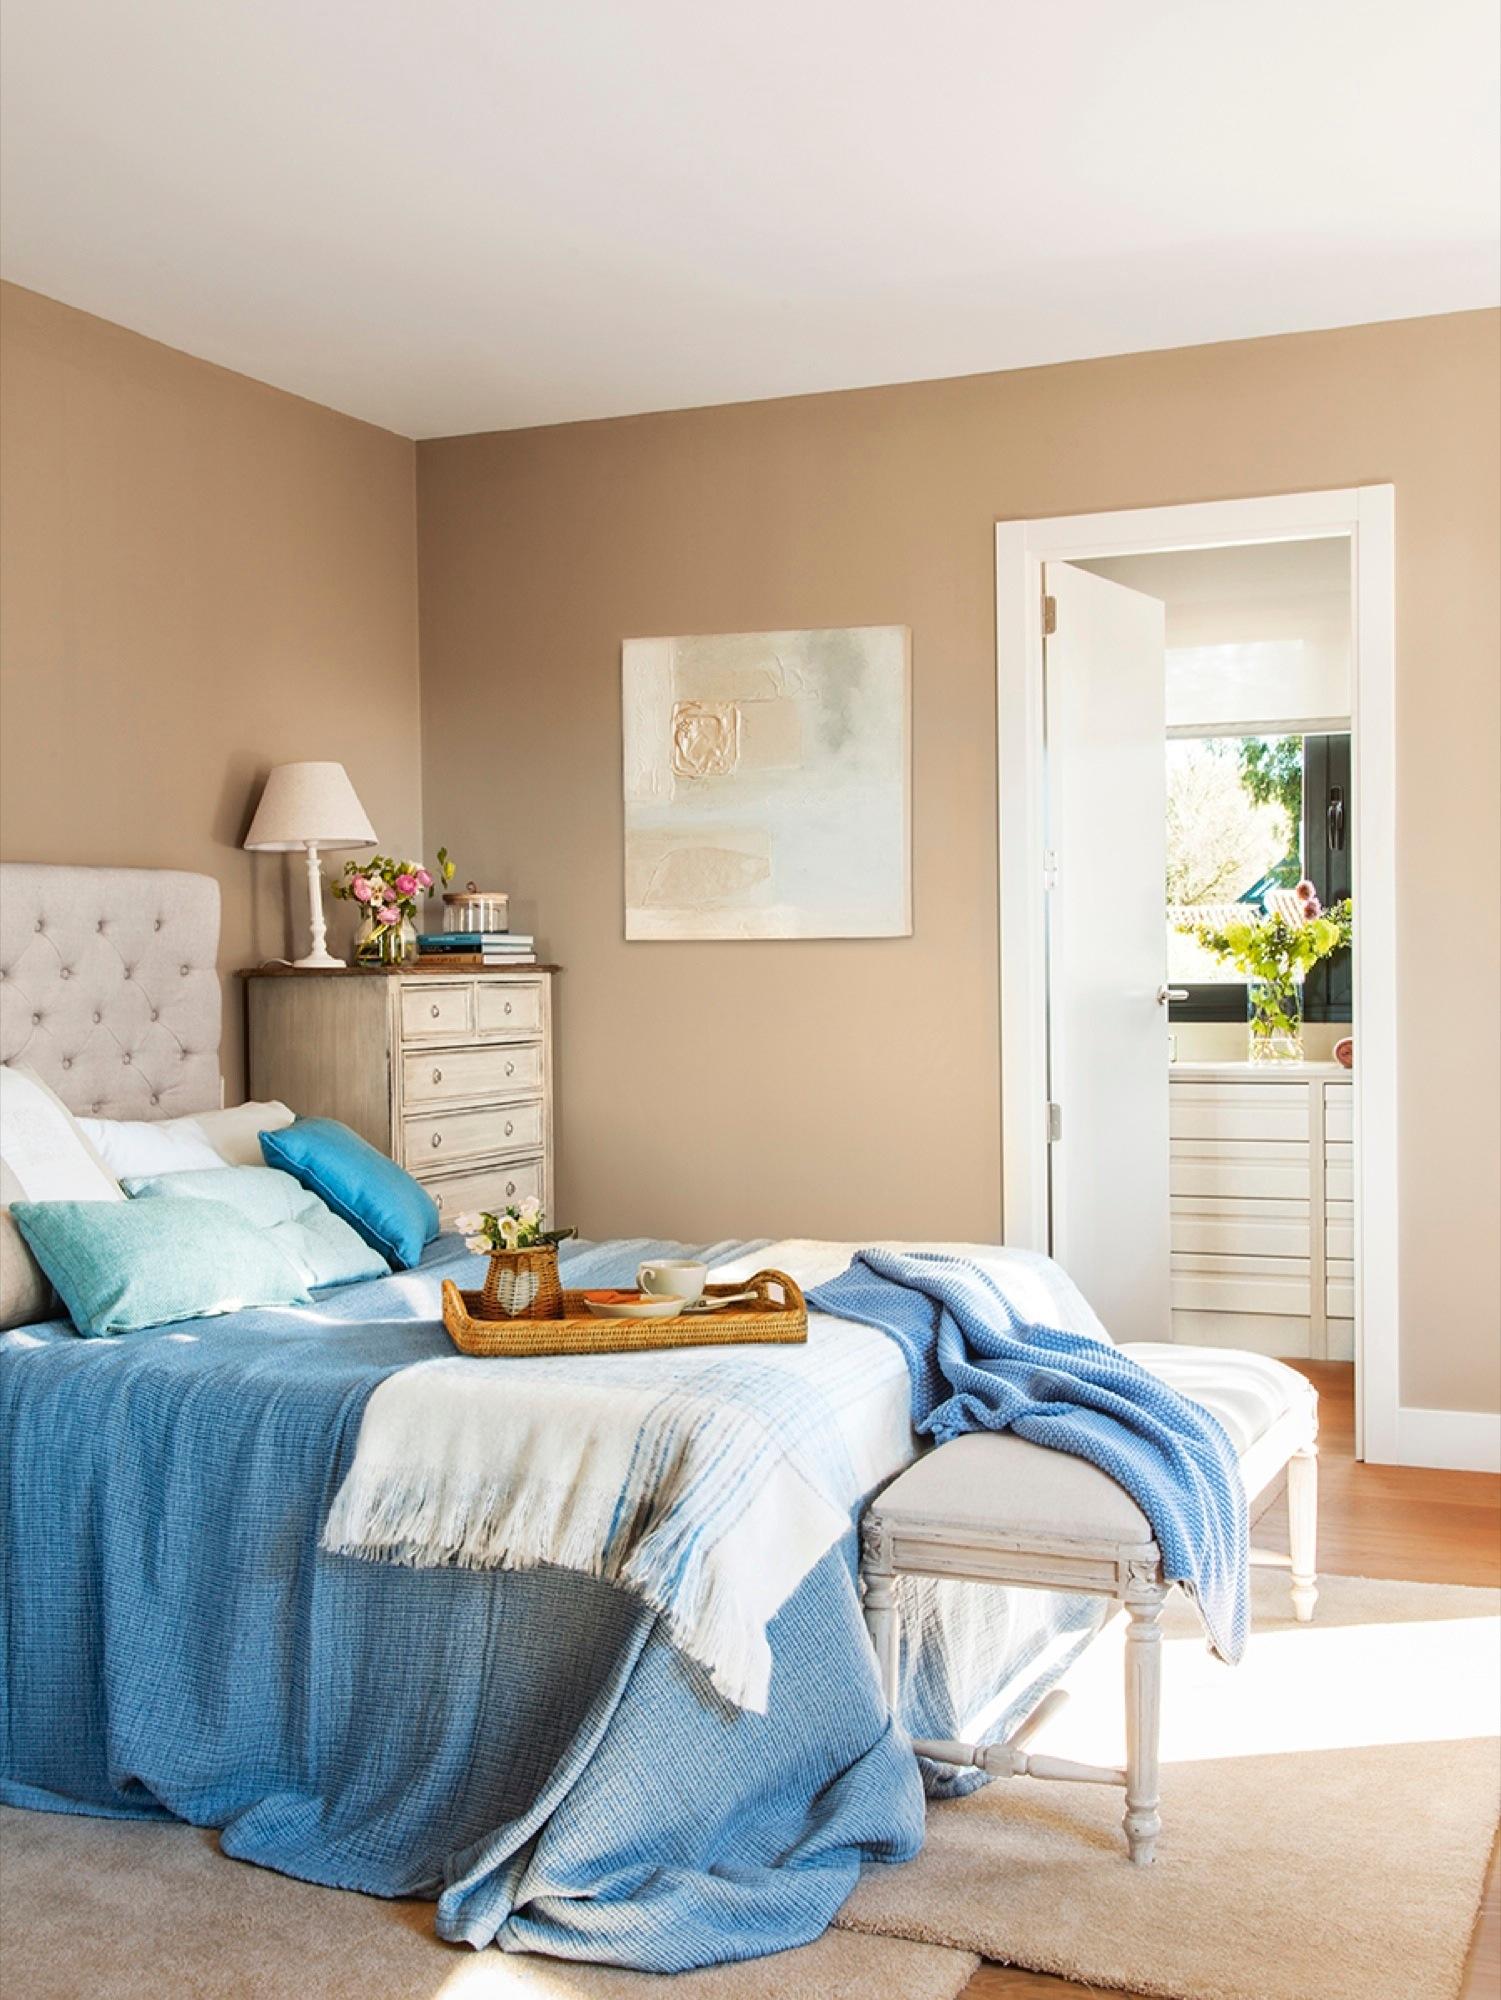 C mo pintar la casa sin ayuda de un pintor profesional - Pintar dormitorio infantil ...